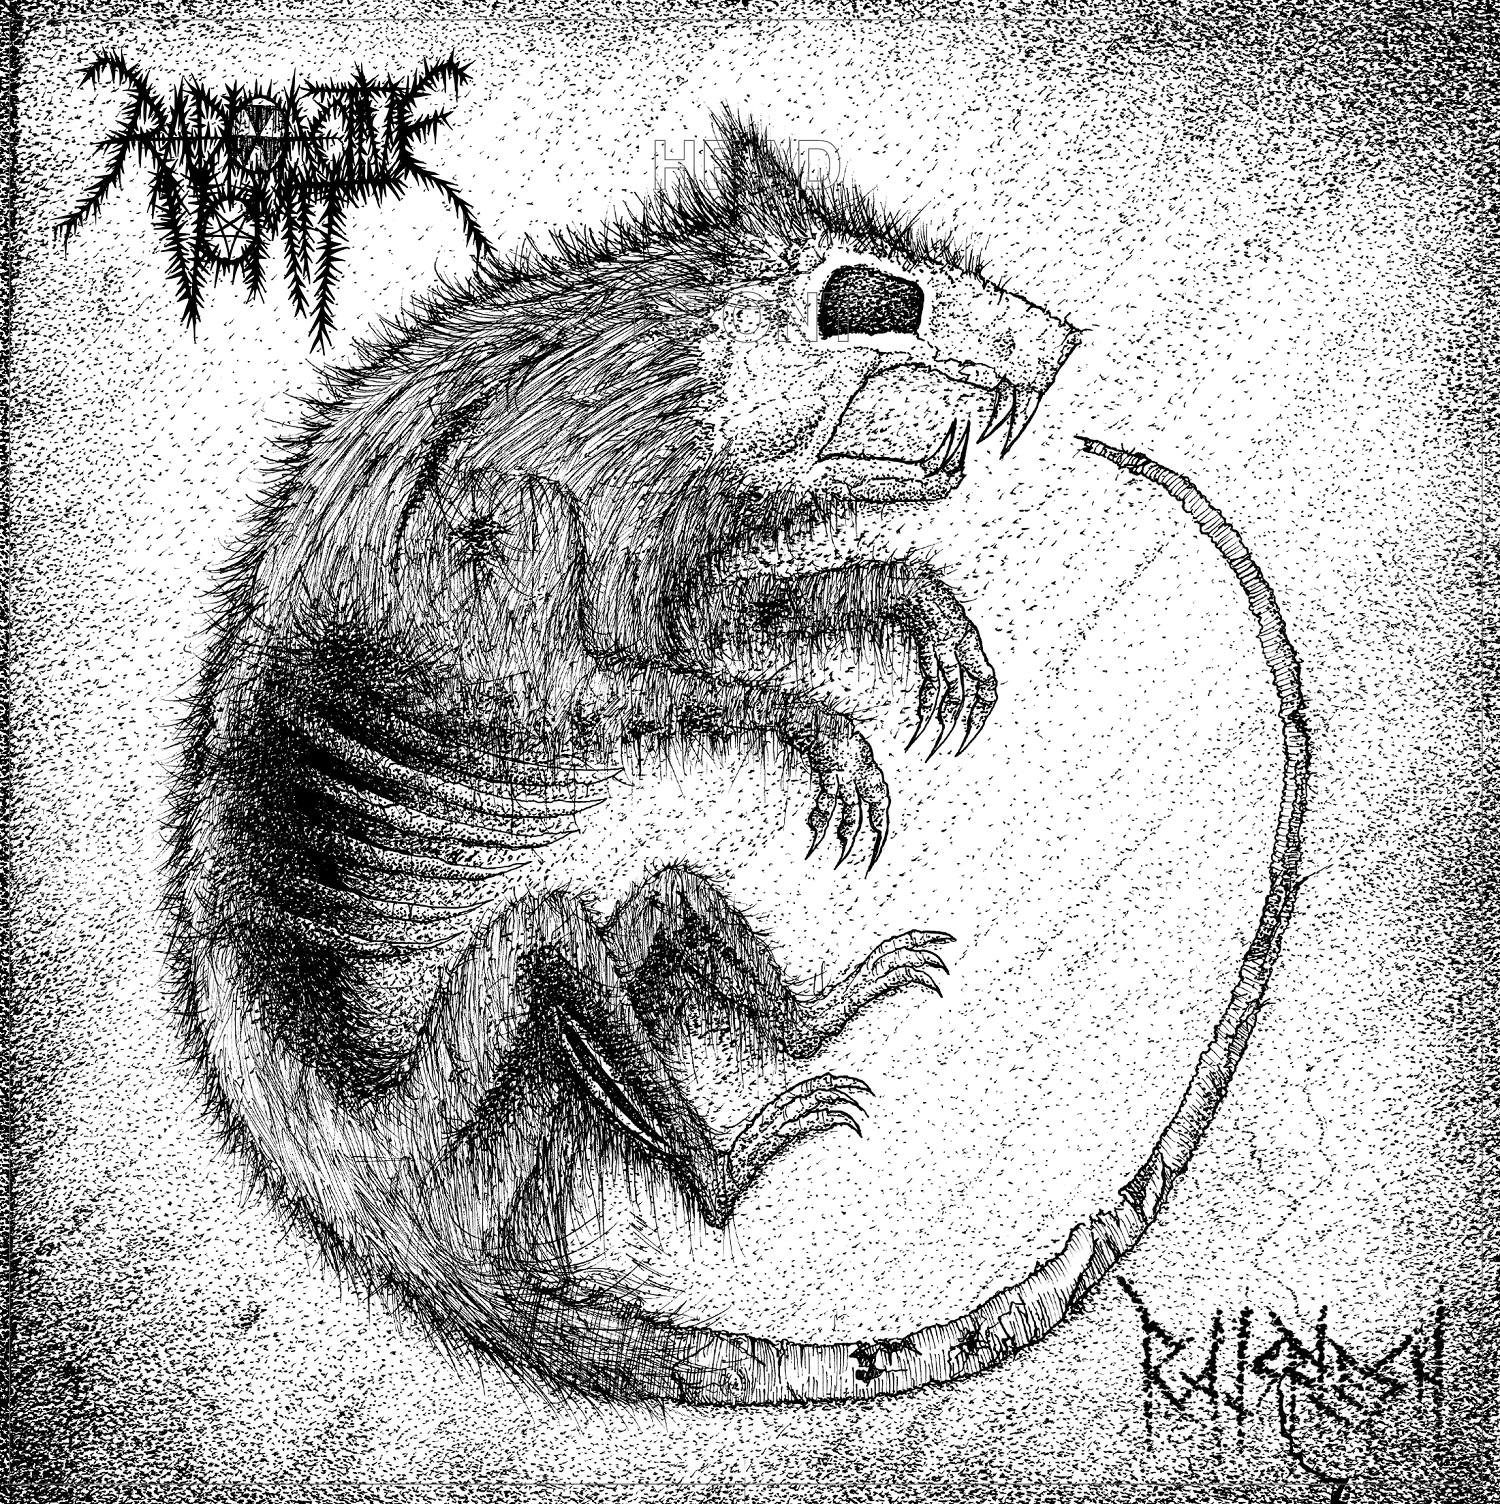 Drawn rat vomit Radioactive Review  Vomit Metal